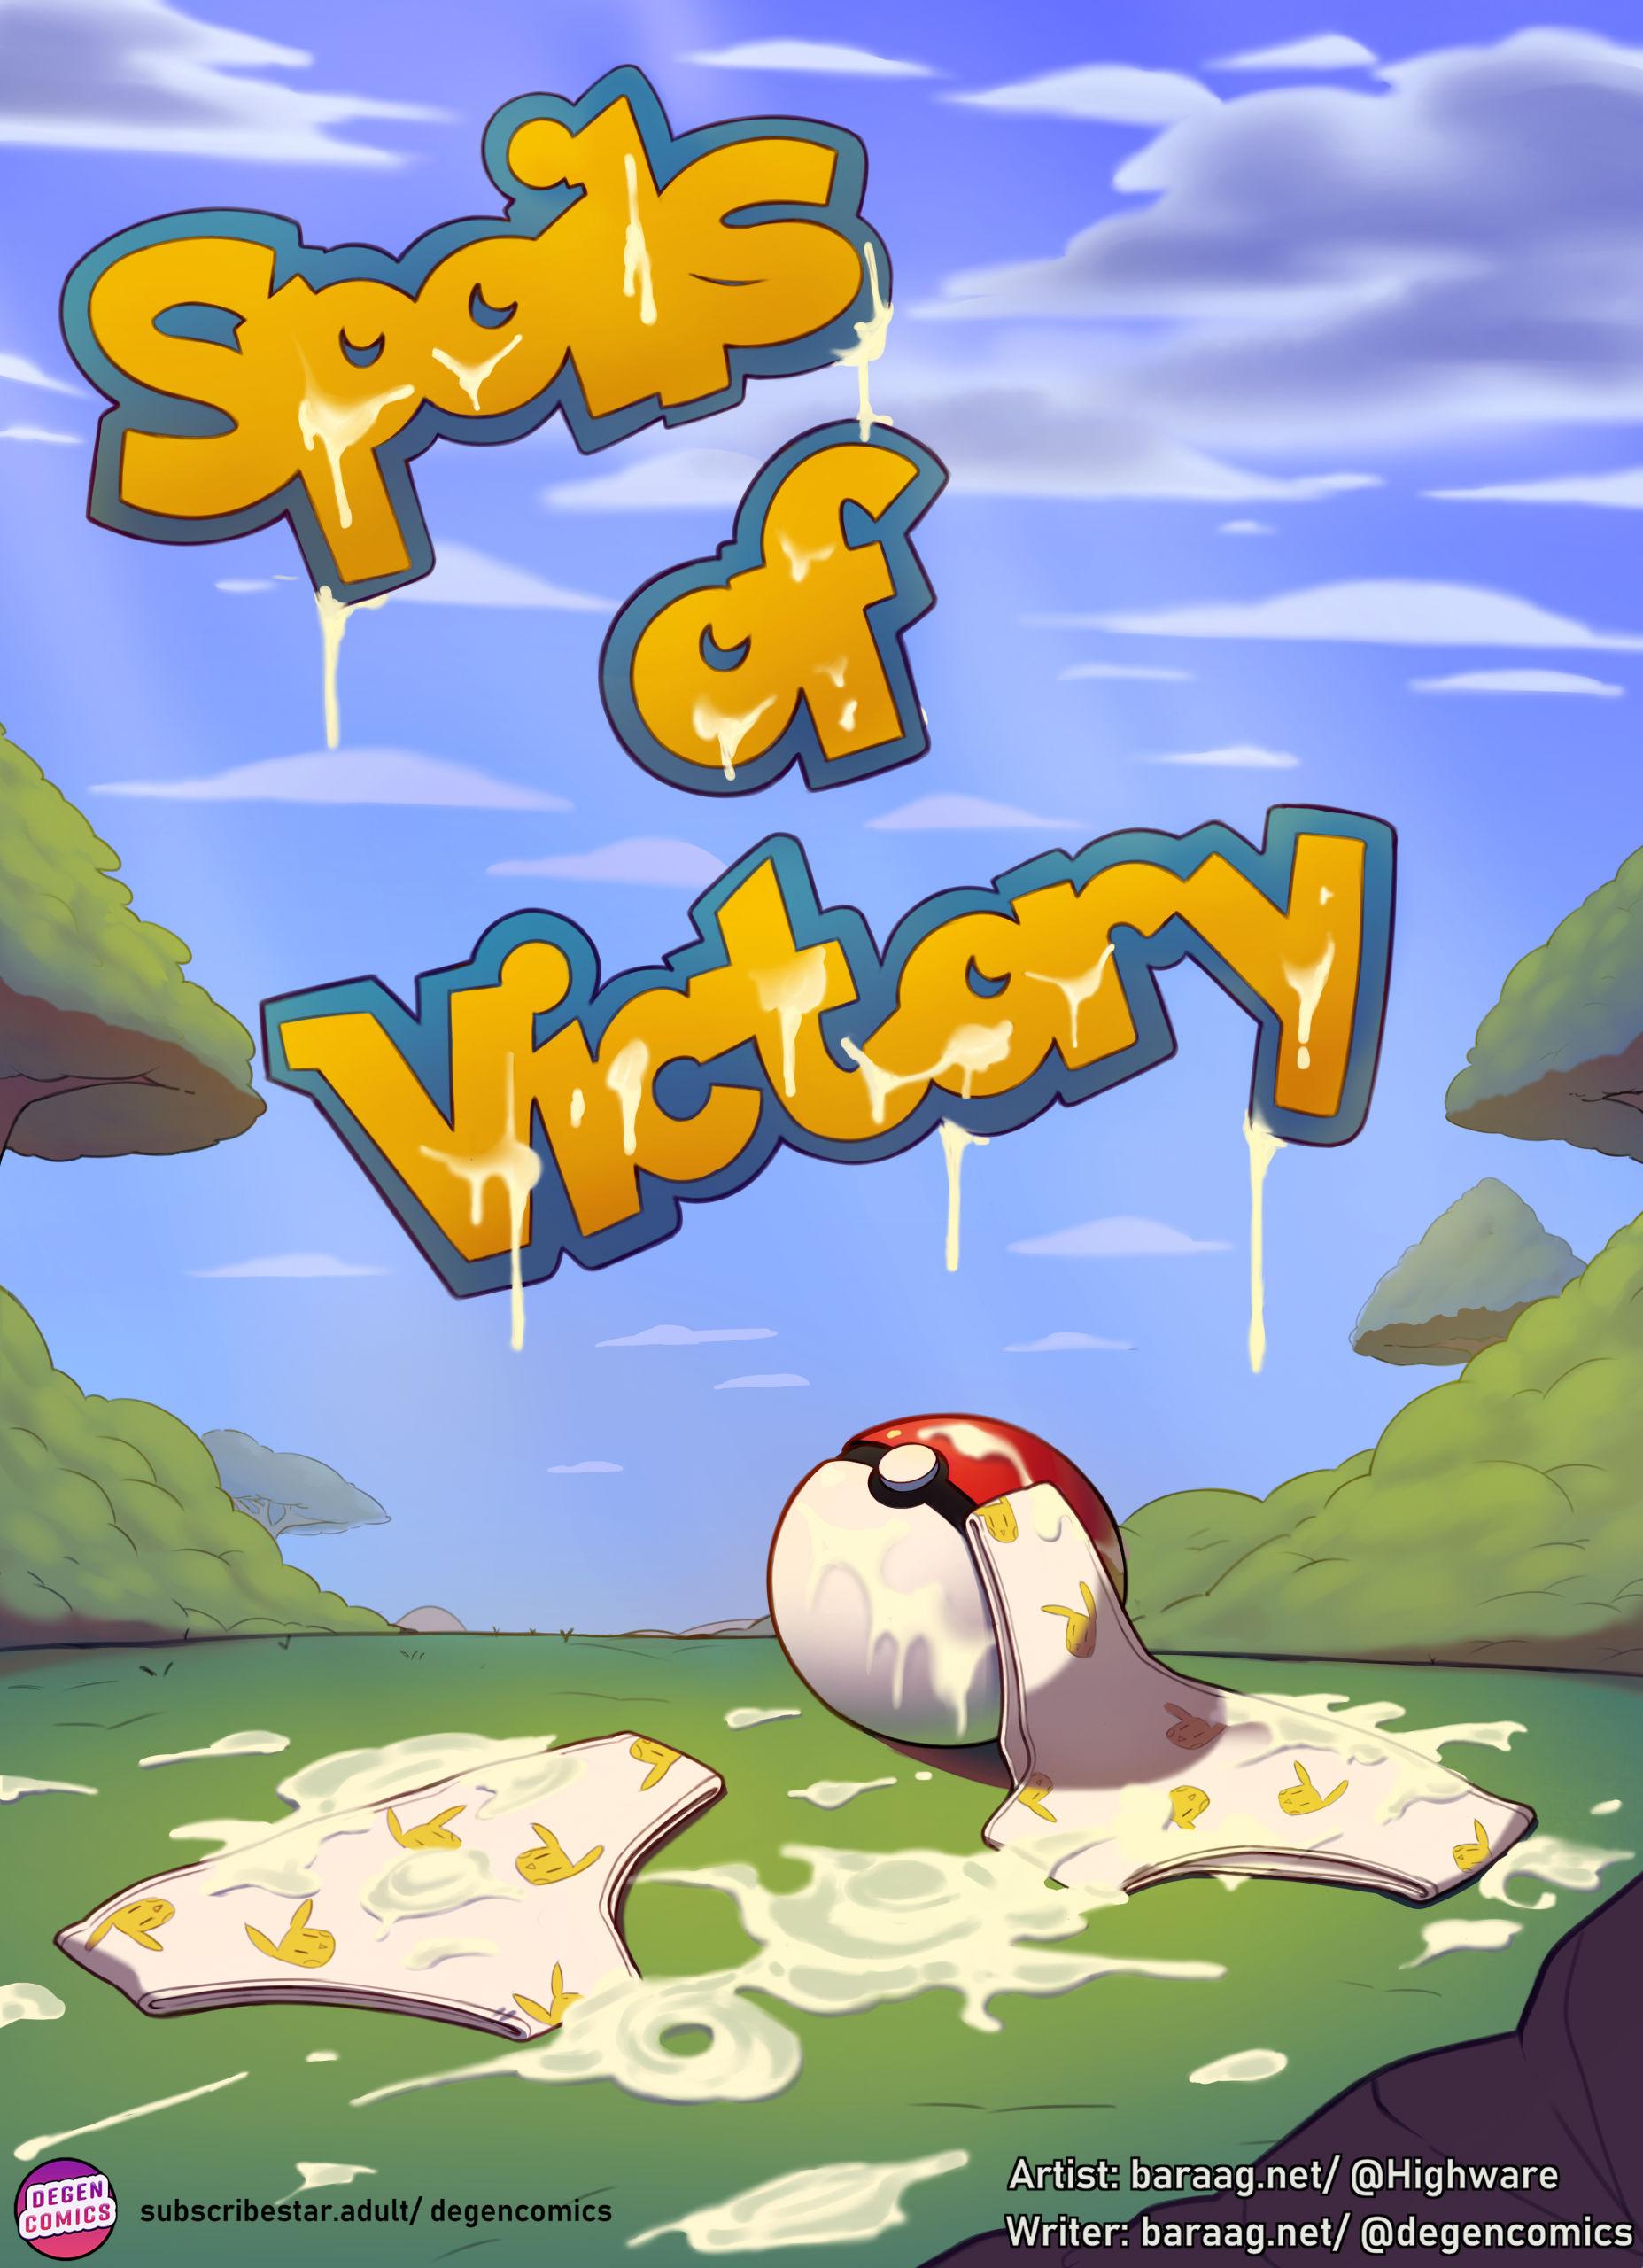 Spoils of victory hentai manga picture 1